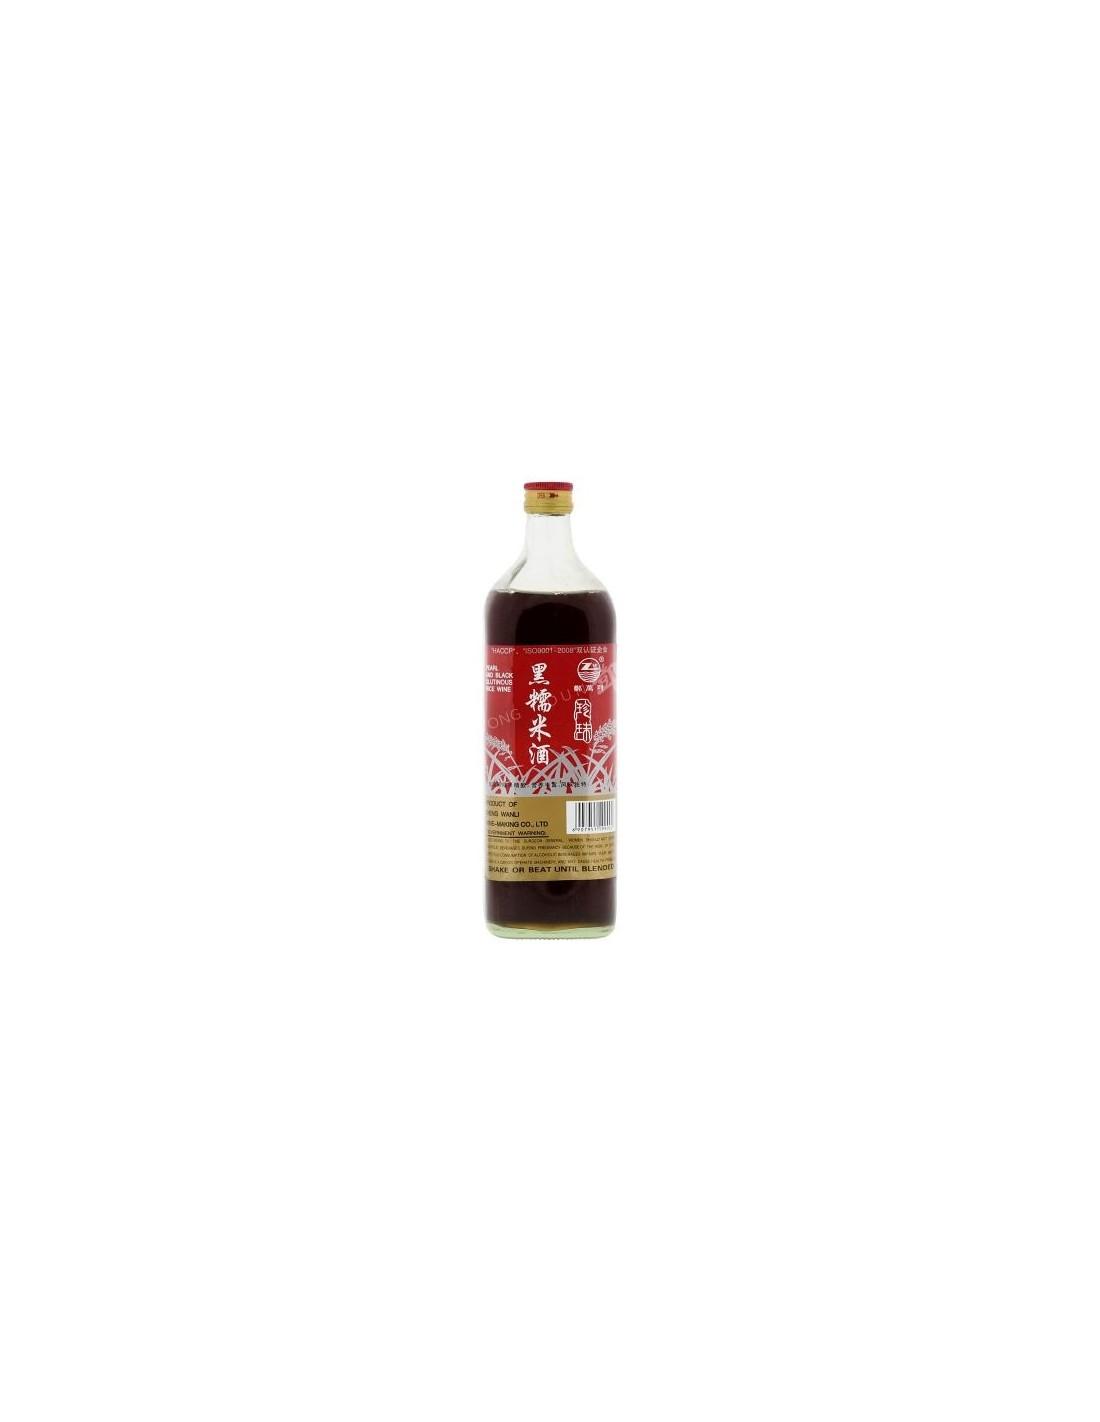 Bautura traditionala vin din orez negru, 12% alc., 0.75L